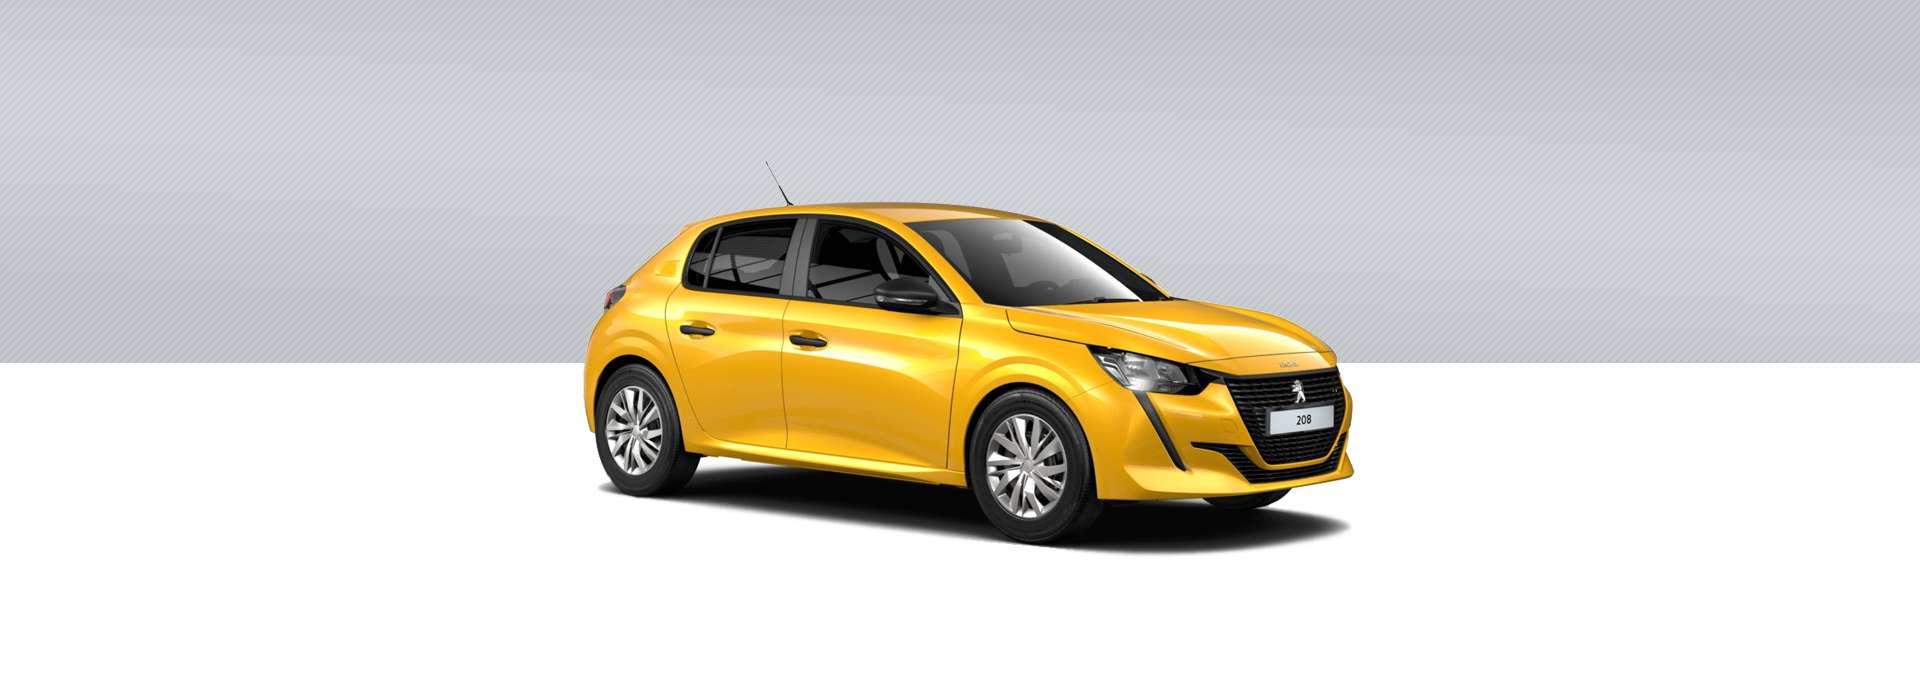 Peugeot Nuevo 208 5 Puertas